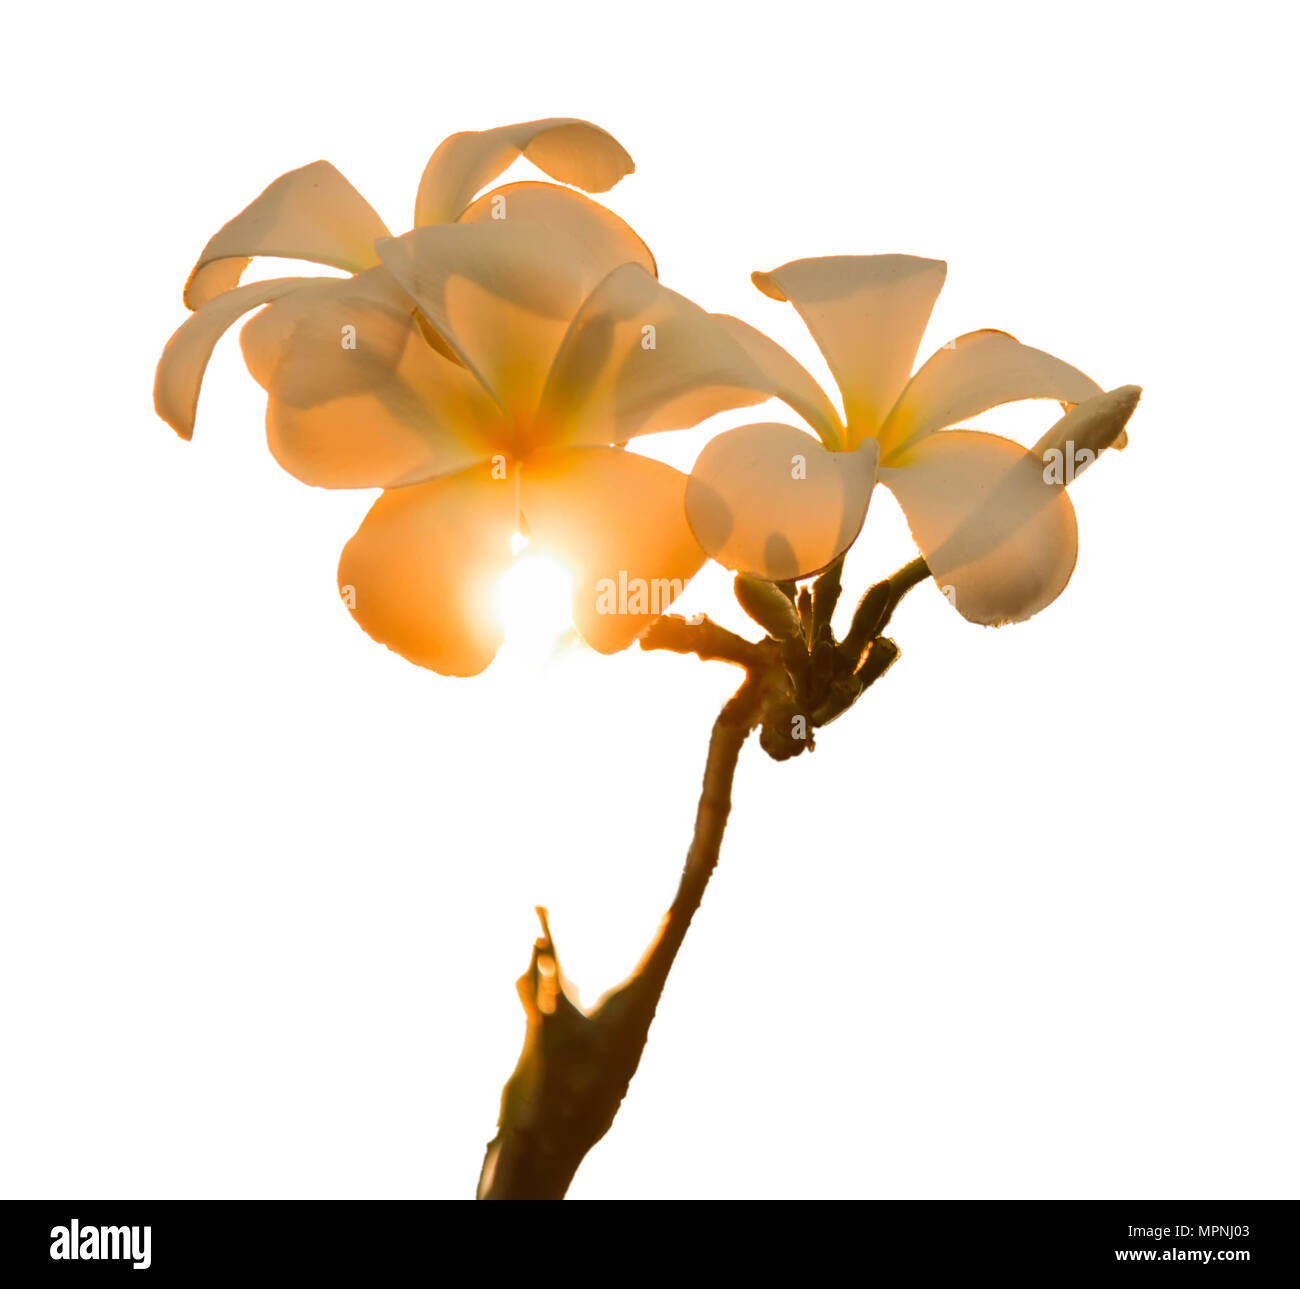 Plumeria frangipani white flowers are exposed to sunlight, orange color changes. on white background. Isolated. - Stock Image